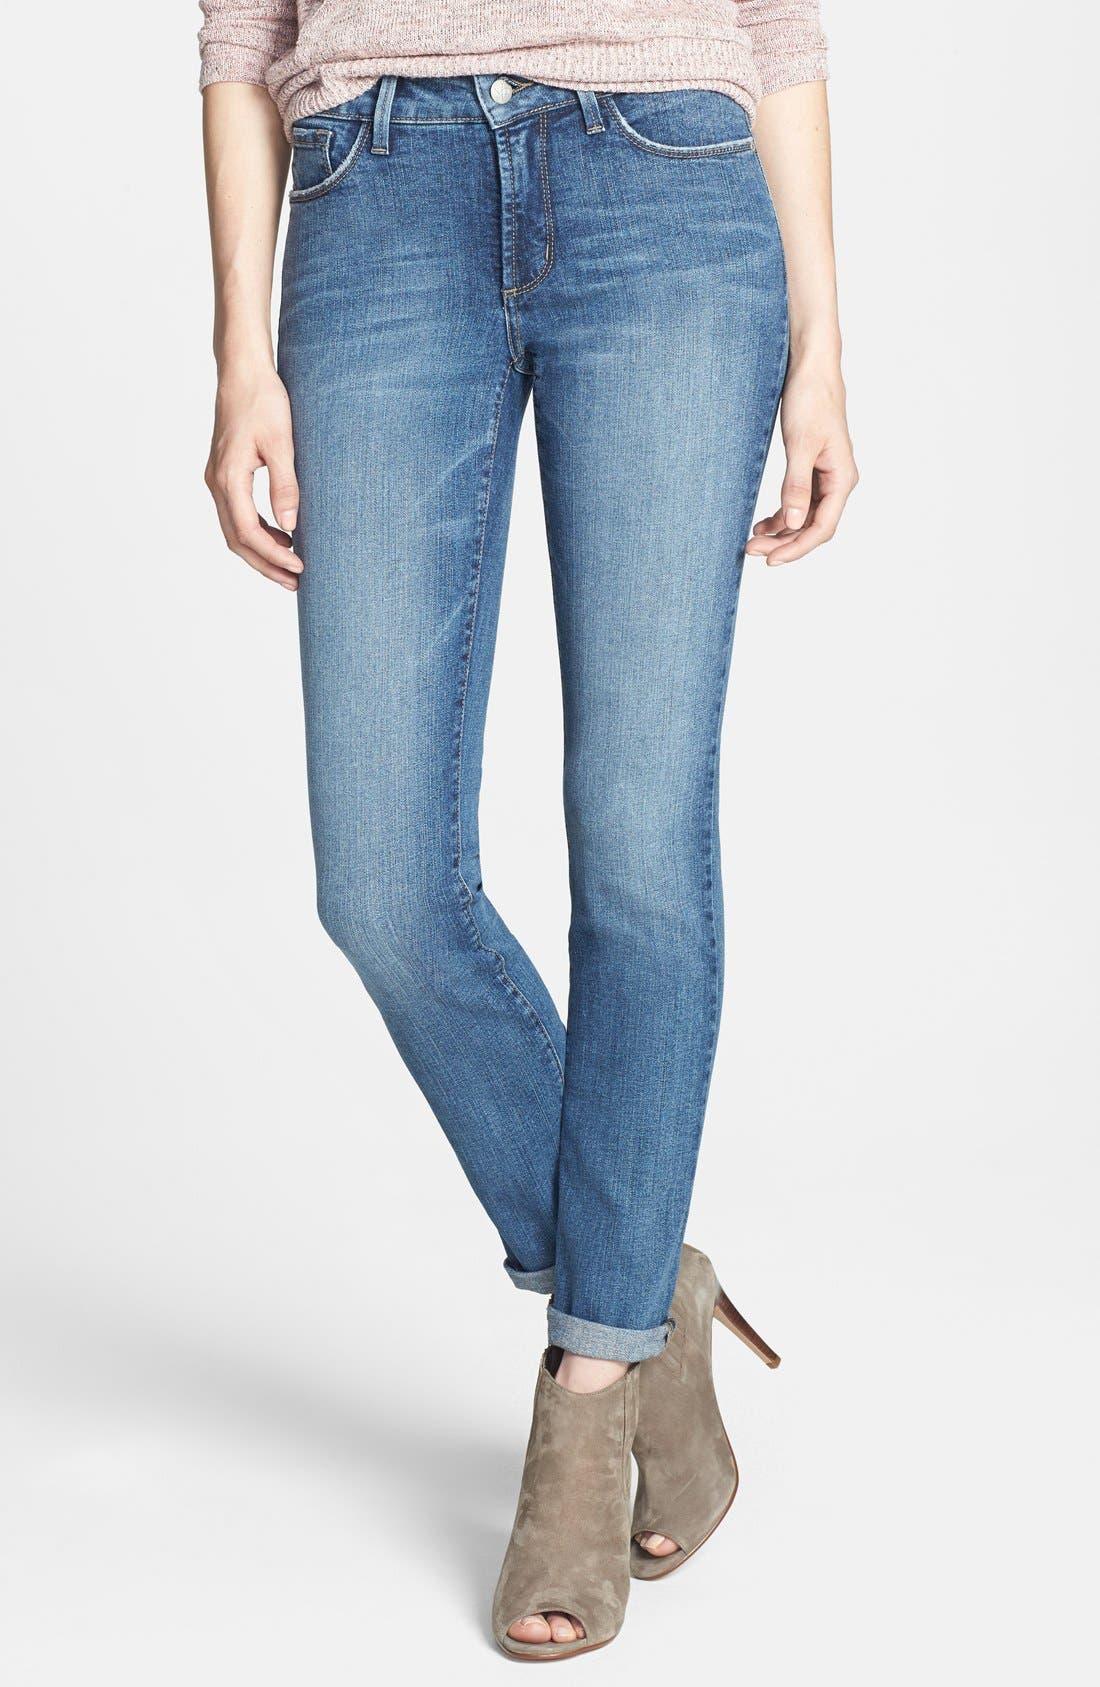 Alternate Image 1 Selected - NYDJ 'Leann' Stretch Boyfriend Jeans (Durham)